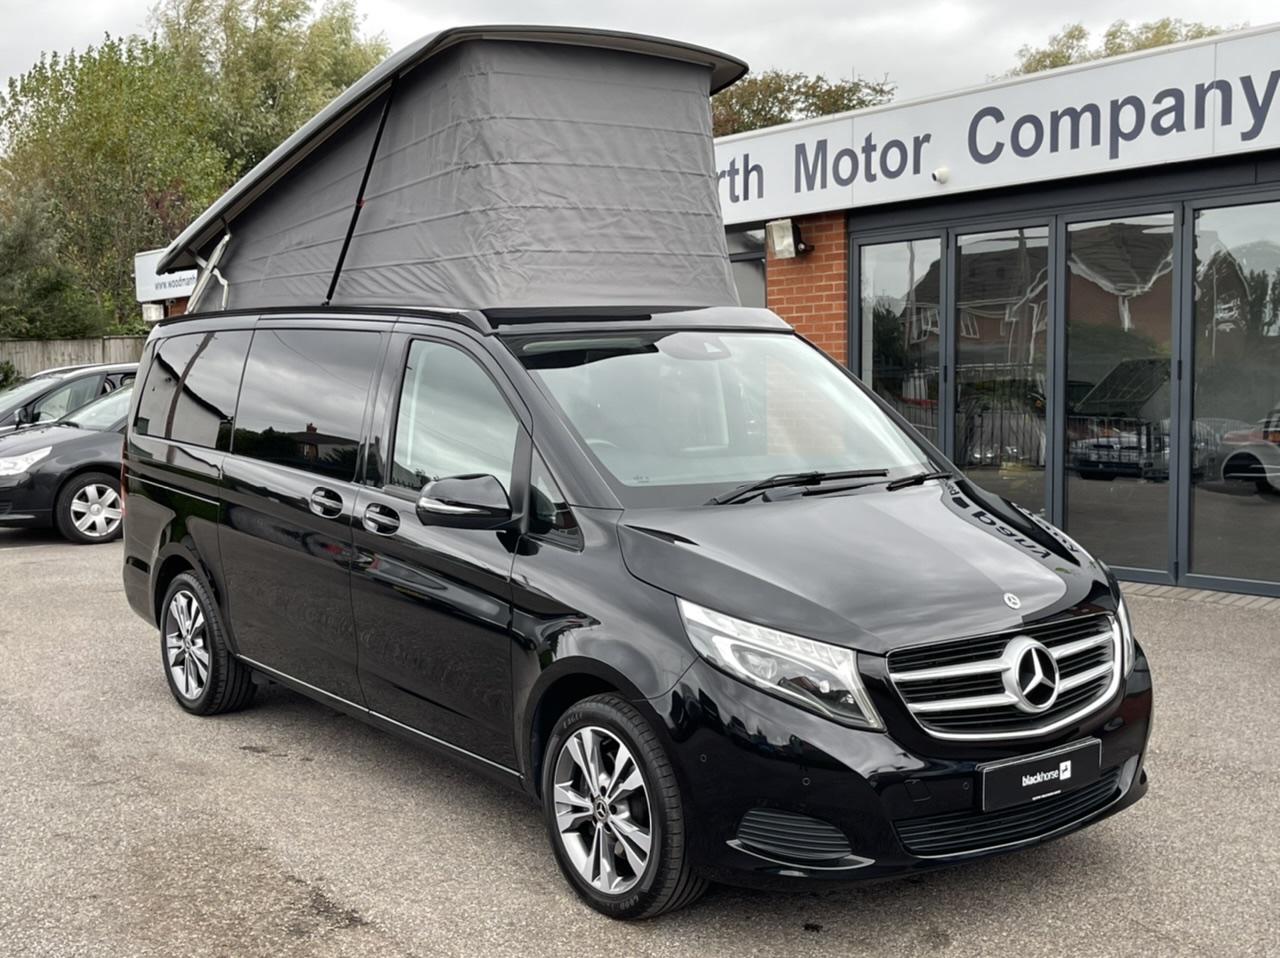 2019 MERCEDES BENZ V220D (163BHP) MARCO POLO HORIZON SPORT AUTO CAMPER VAN - Only 8k miles - Mercedes Warranty